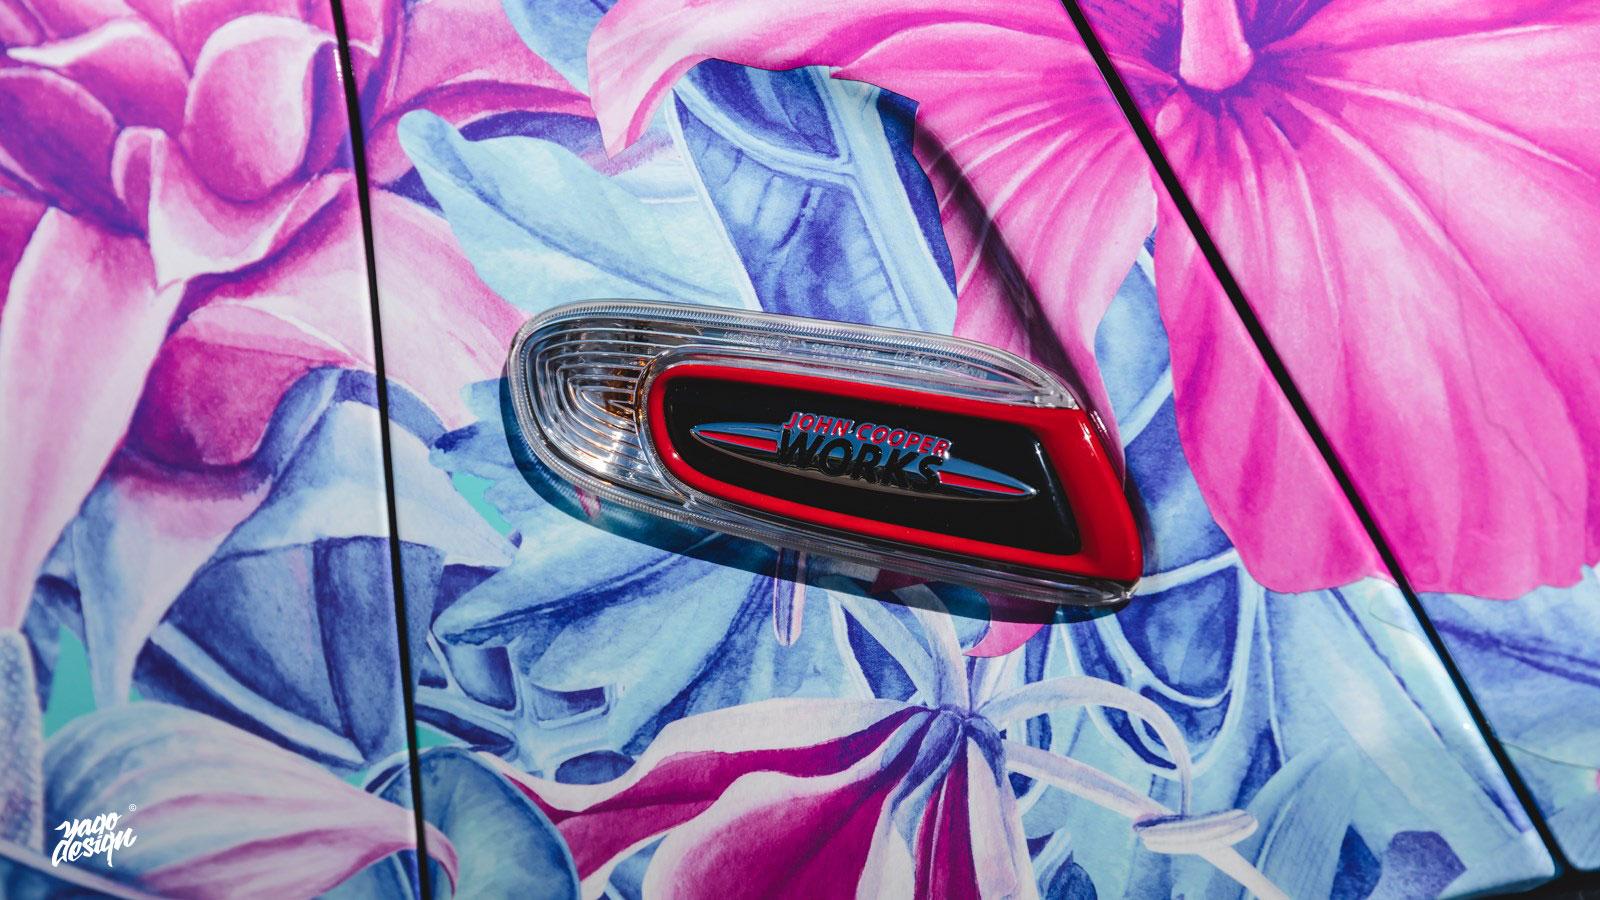 Mini-cooper-JCW-by-Yagodesign-by-Kamil-Lizak-Car-wrapping-Design-Studio-Automotive-Design-Studio-Kawai-11